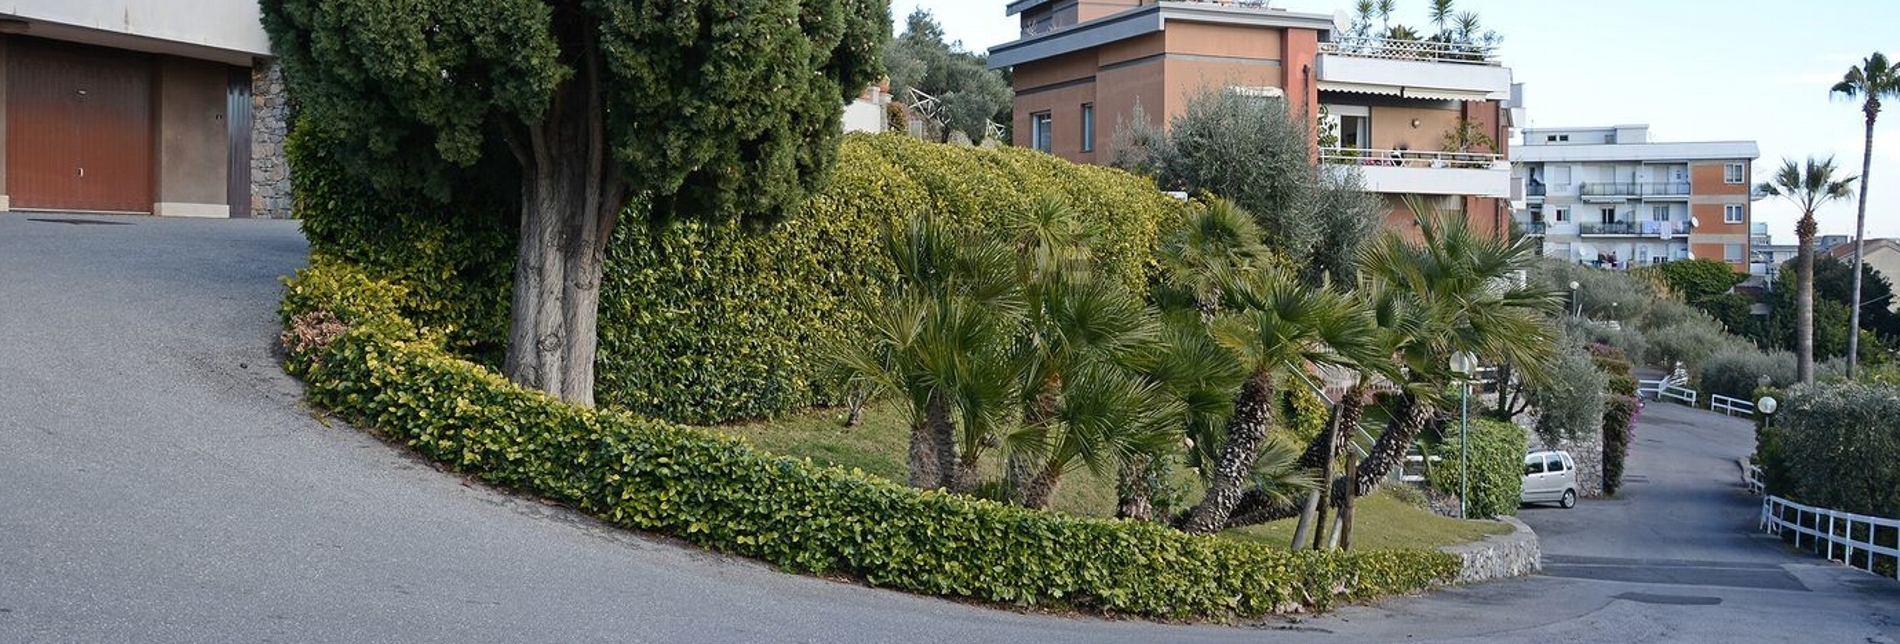 Europe Italie Albenga La Gallinara